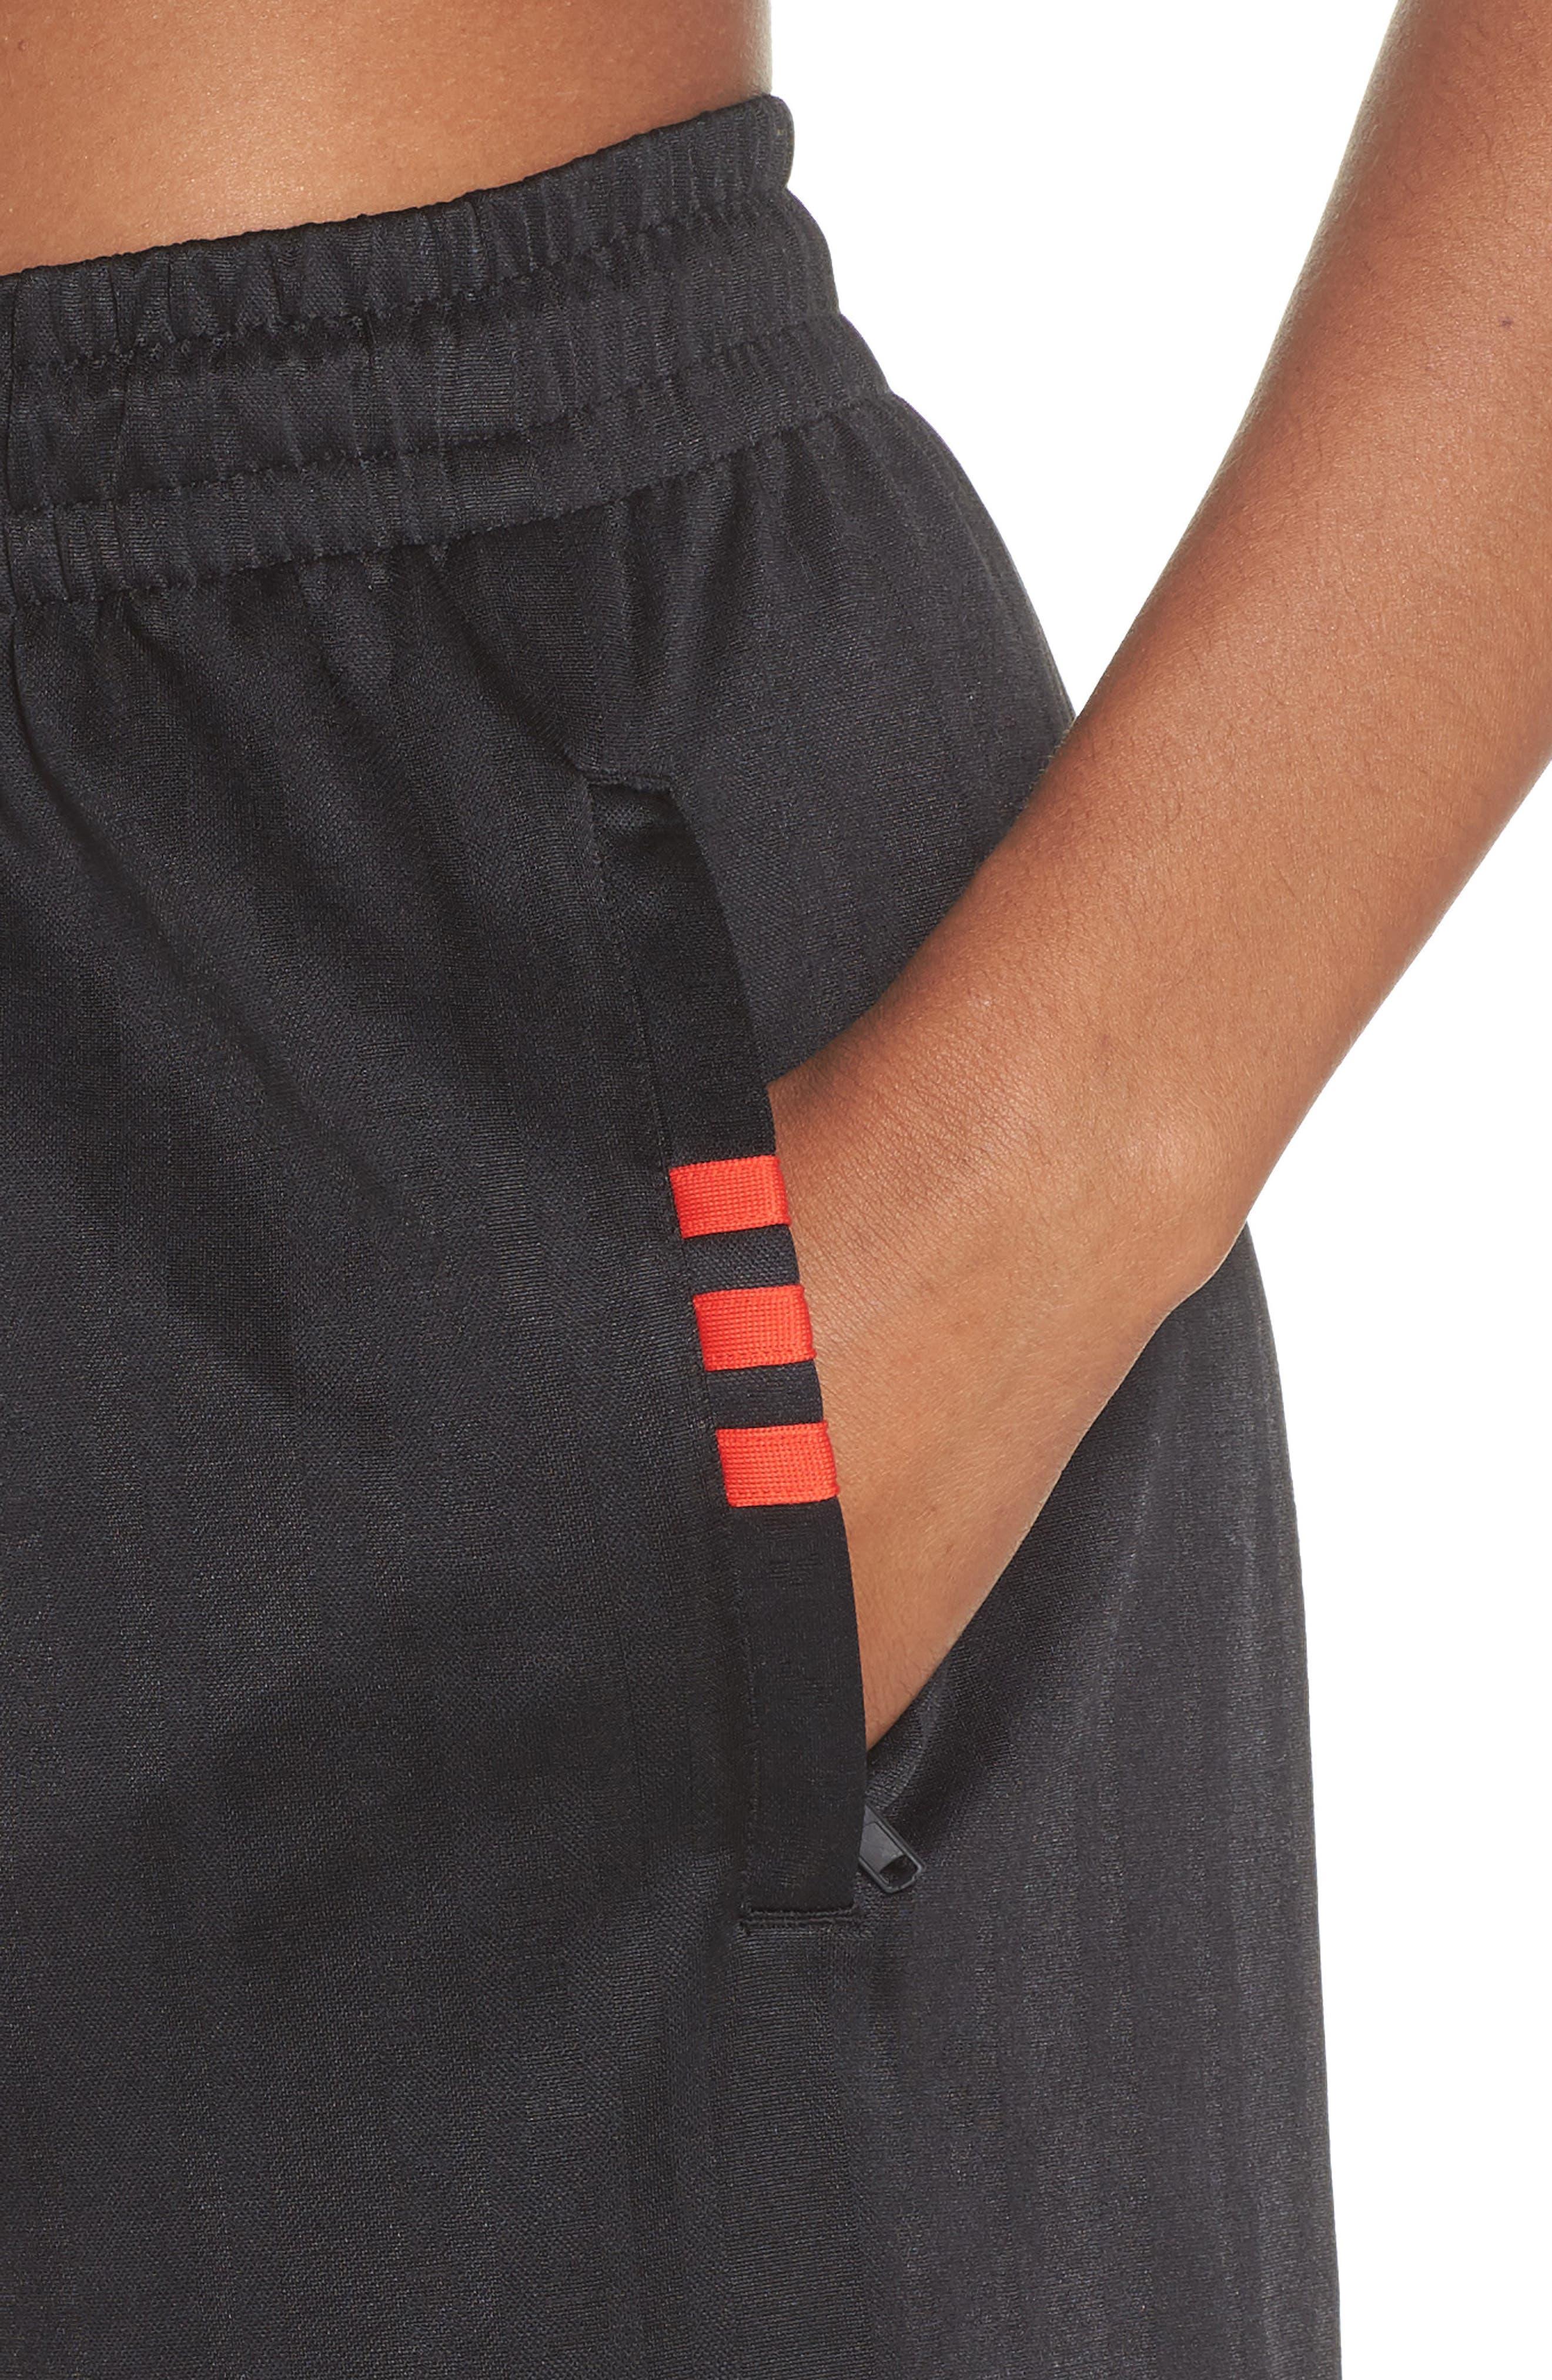 Soccer Shorts,                             Alternate thumbnail 4, color,                             Black/ Core Red